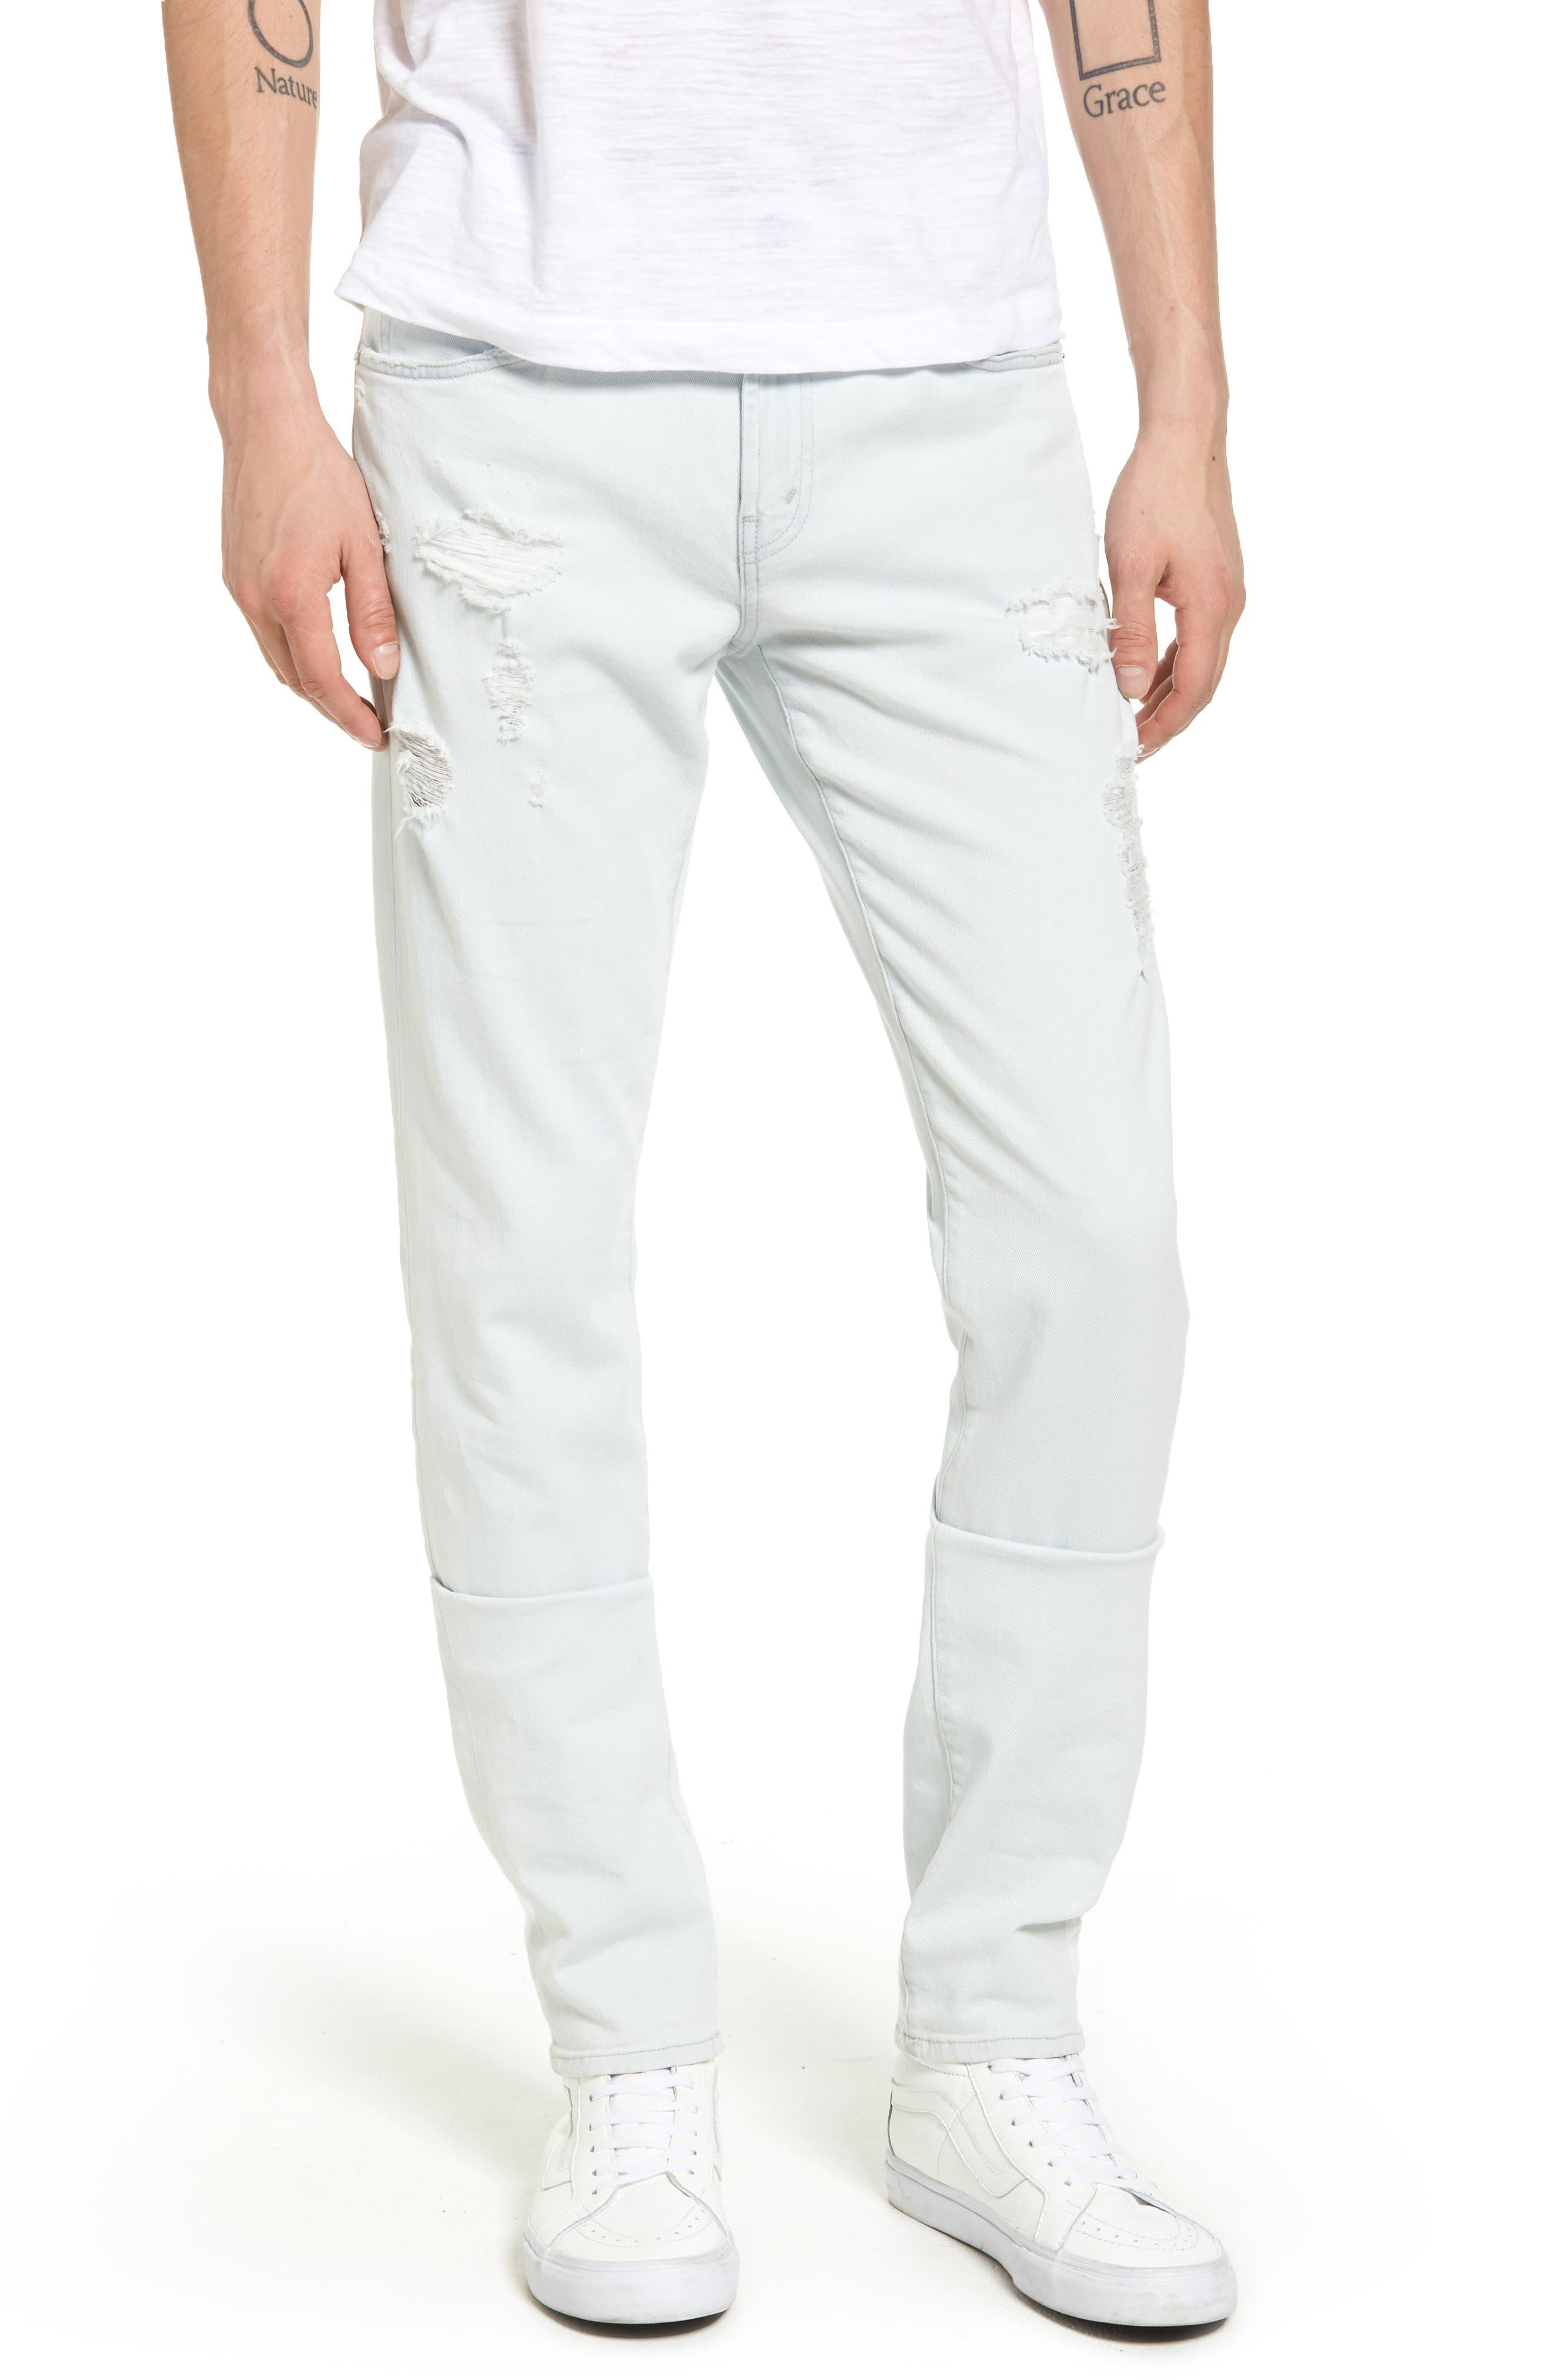 J Brand Skinny Fit Jeans (Aquilae)